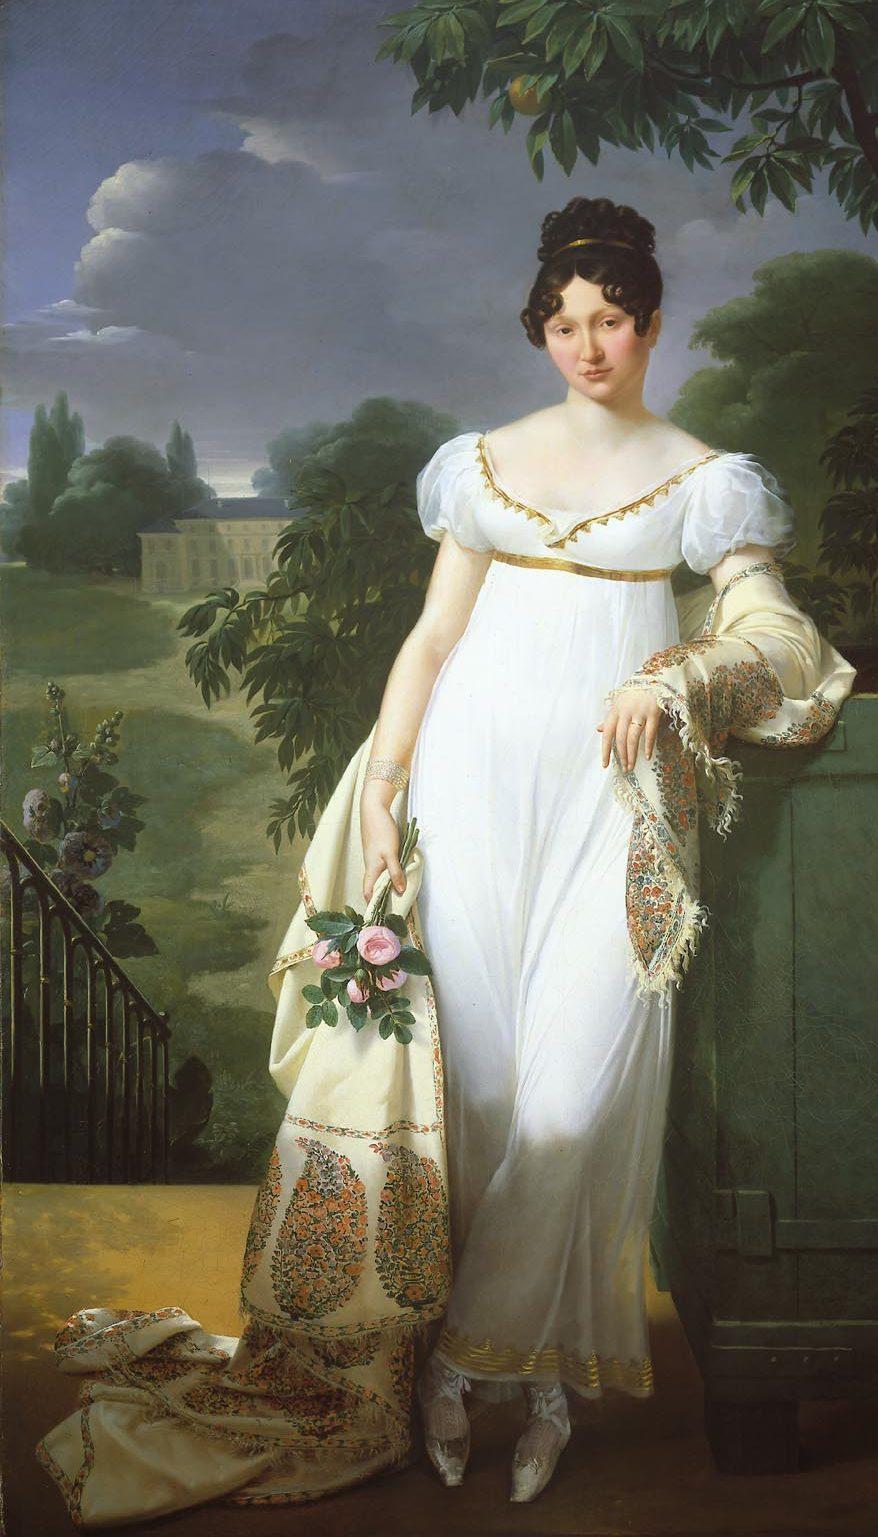 1808 the classic Empire line dress